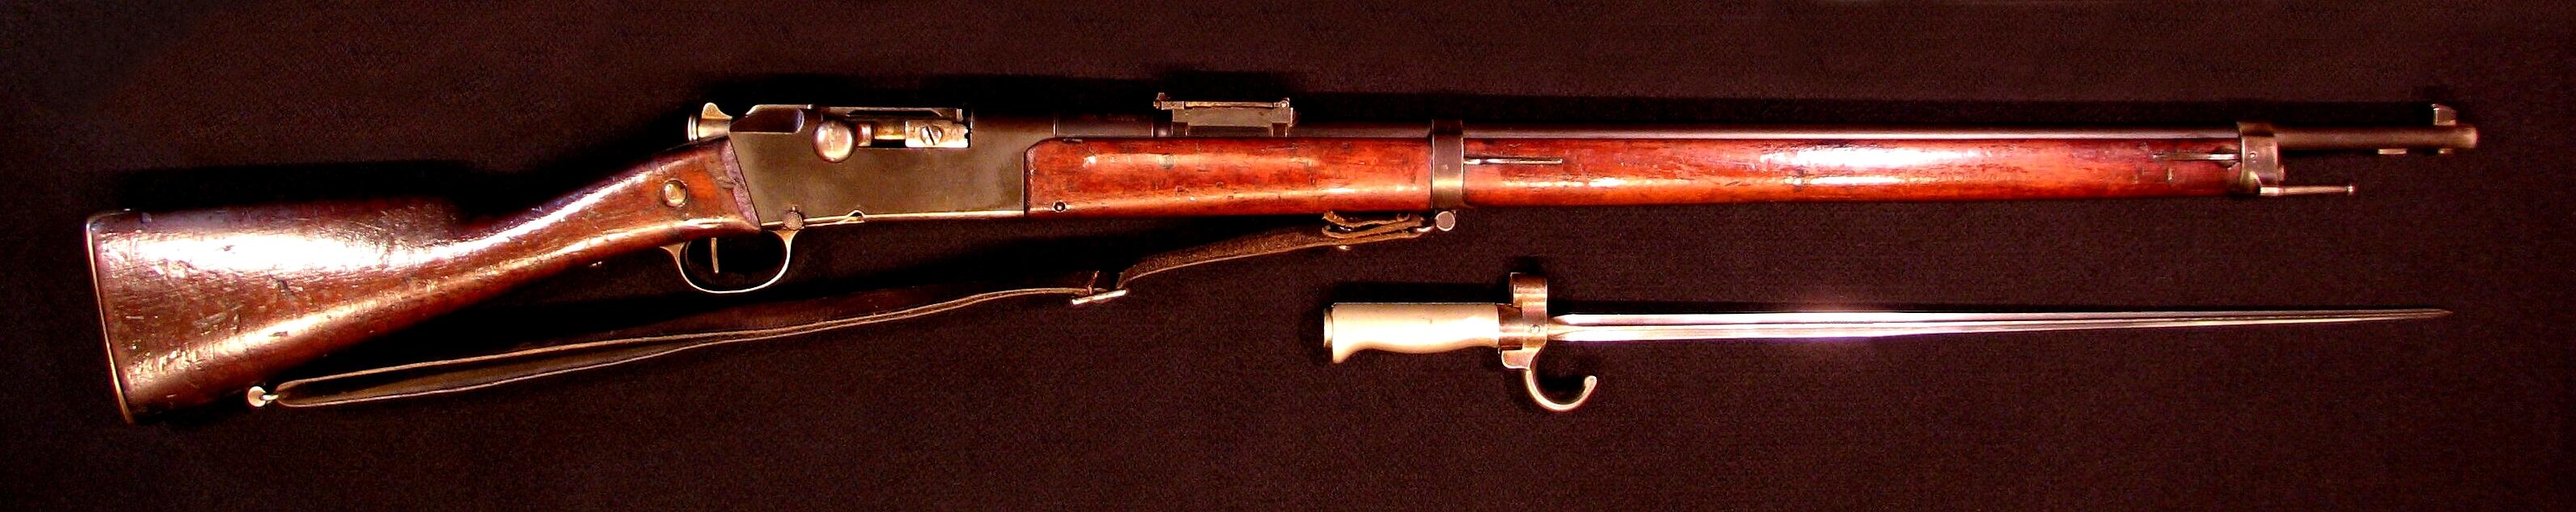 Click image for larger version.  Name:Mle 1886 Lebel Rifle 01B (1).jpg Views:11 Size:1.65 MB ID:3687191